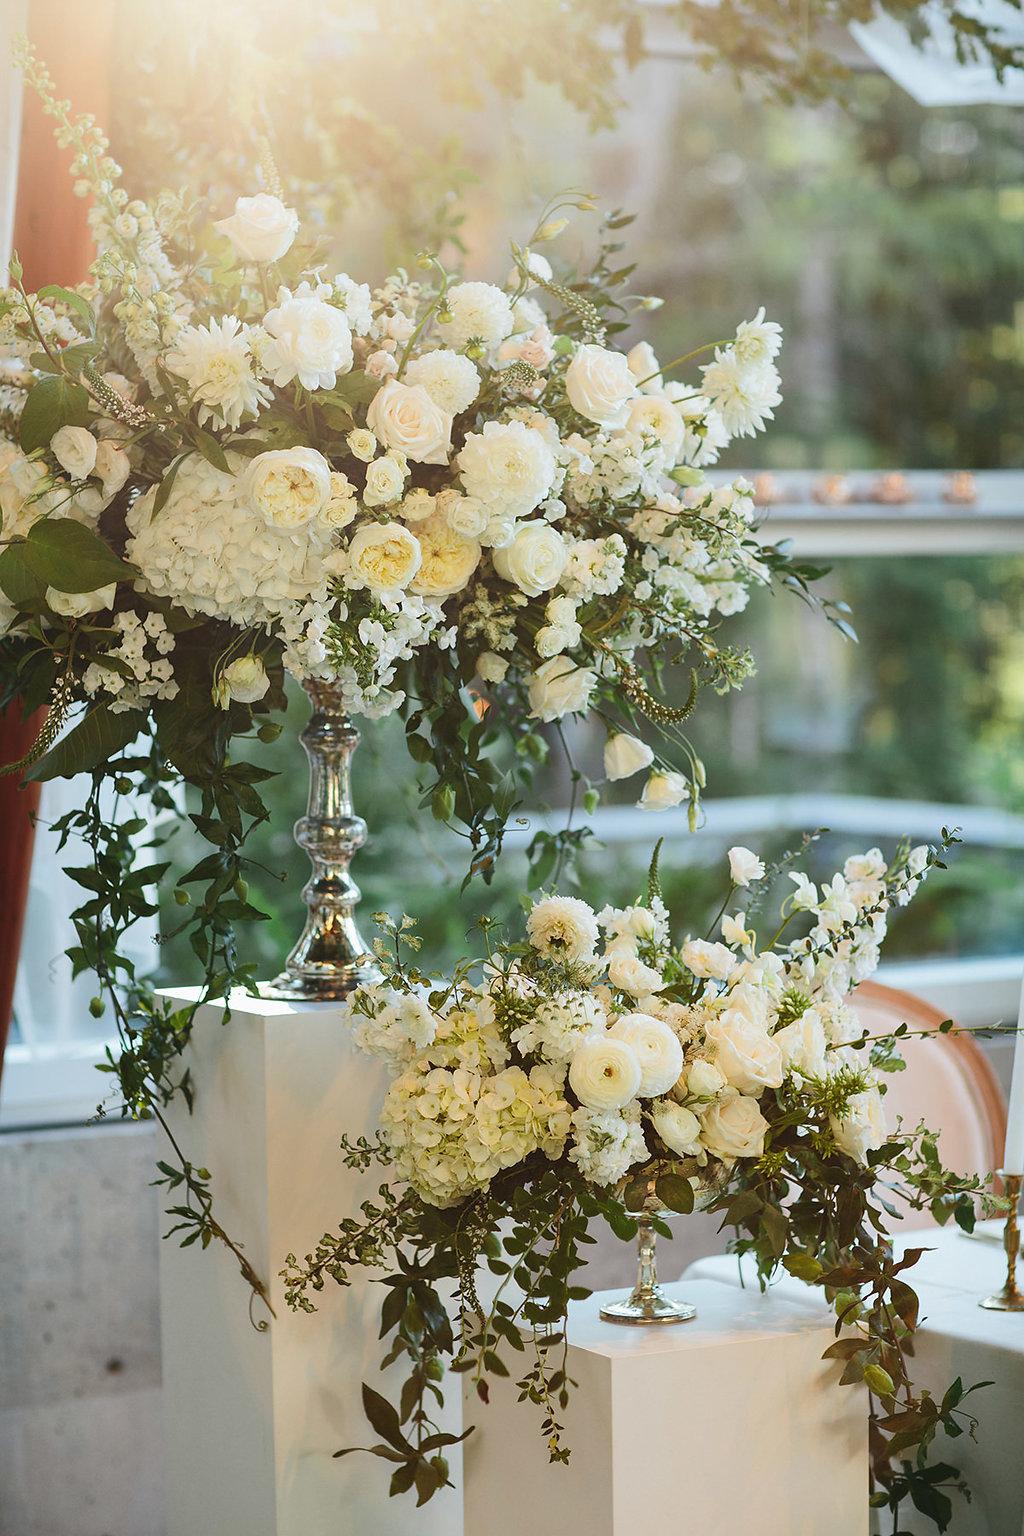 wedding floral inspiration - photo by Melia Lucida https://ruffledblog.com/elegant-canadian-wedding-with-greenery